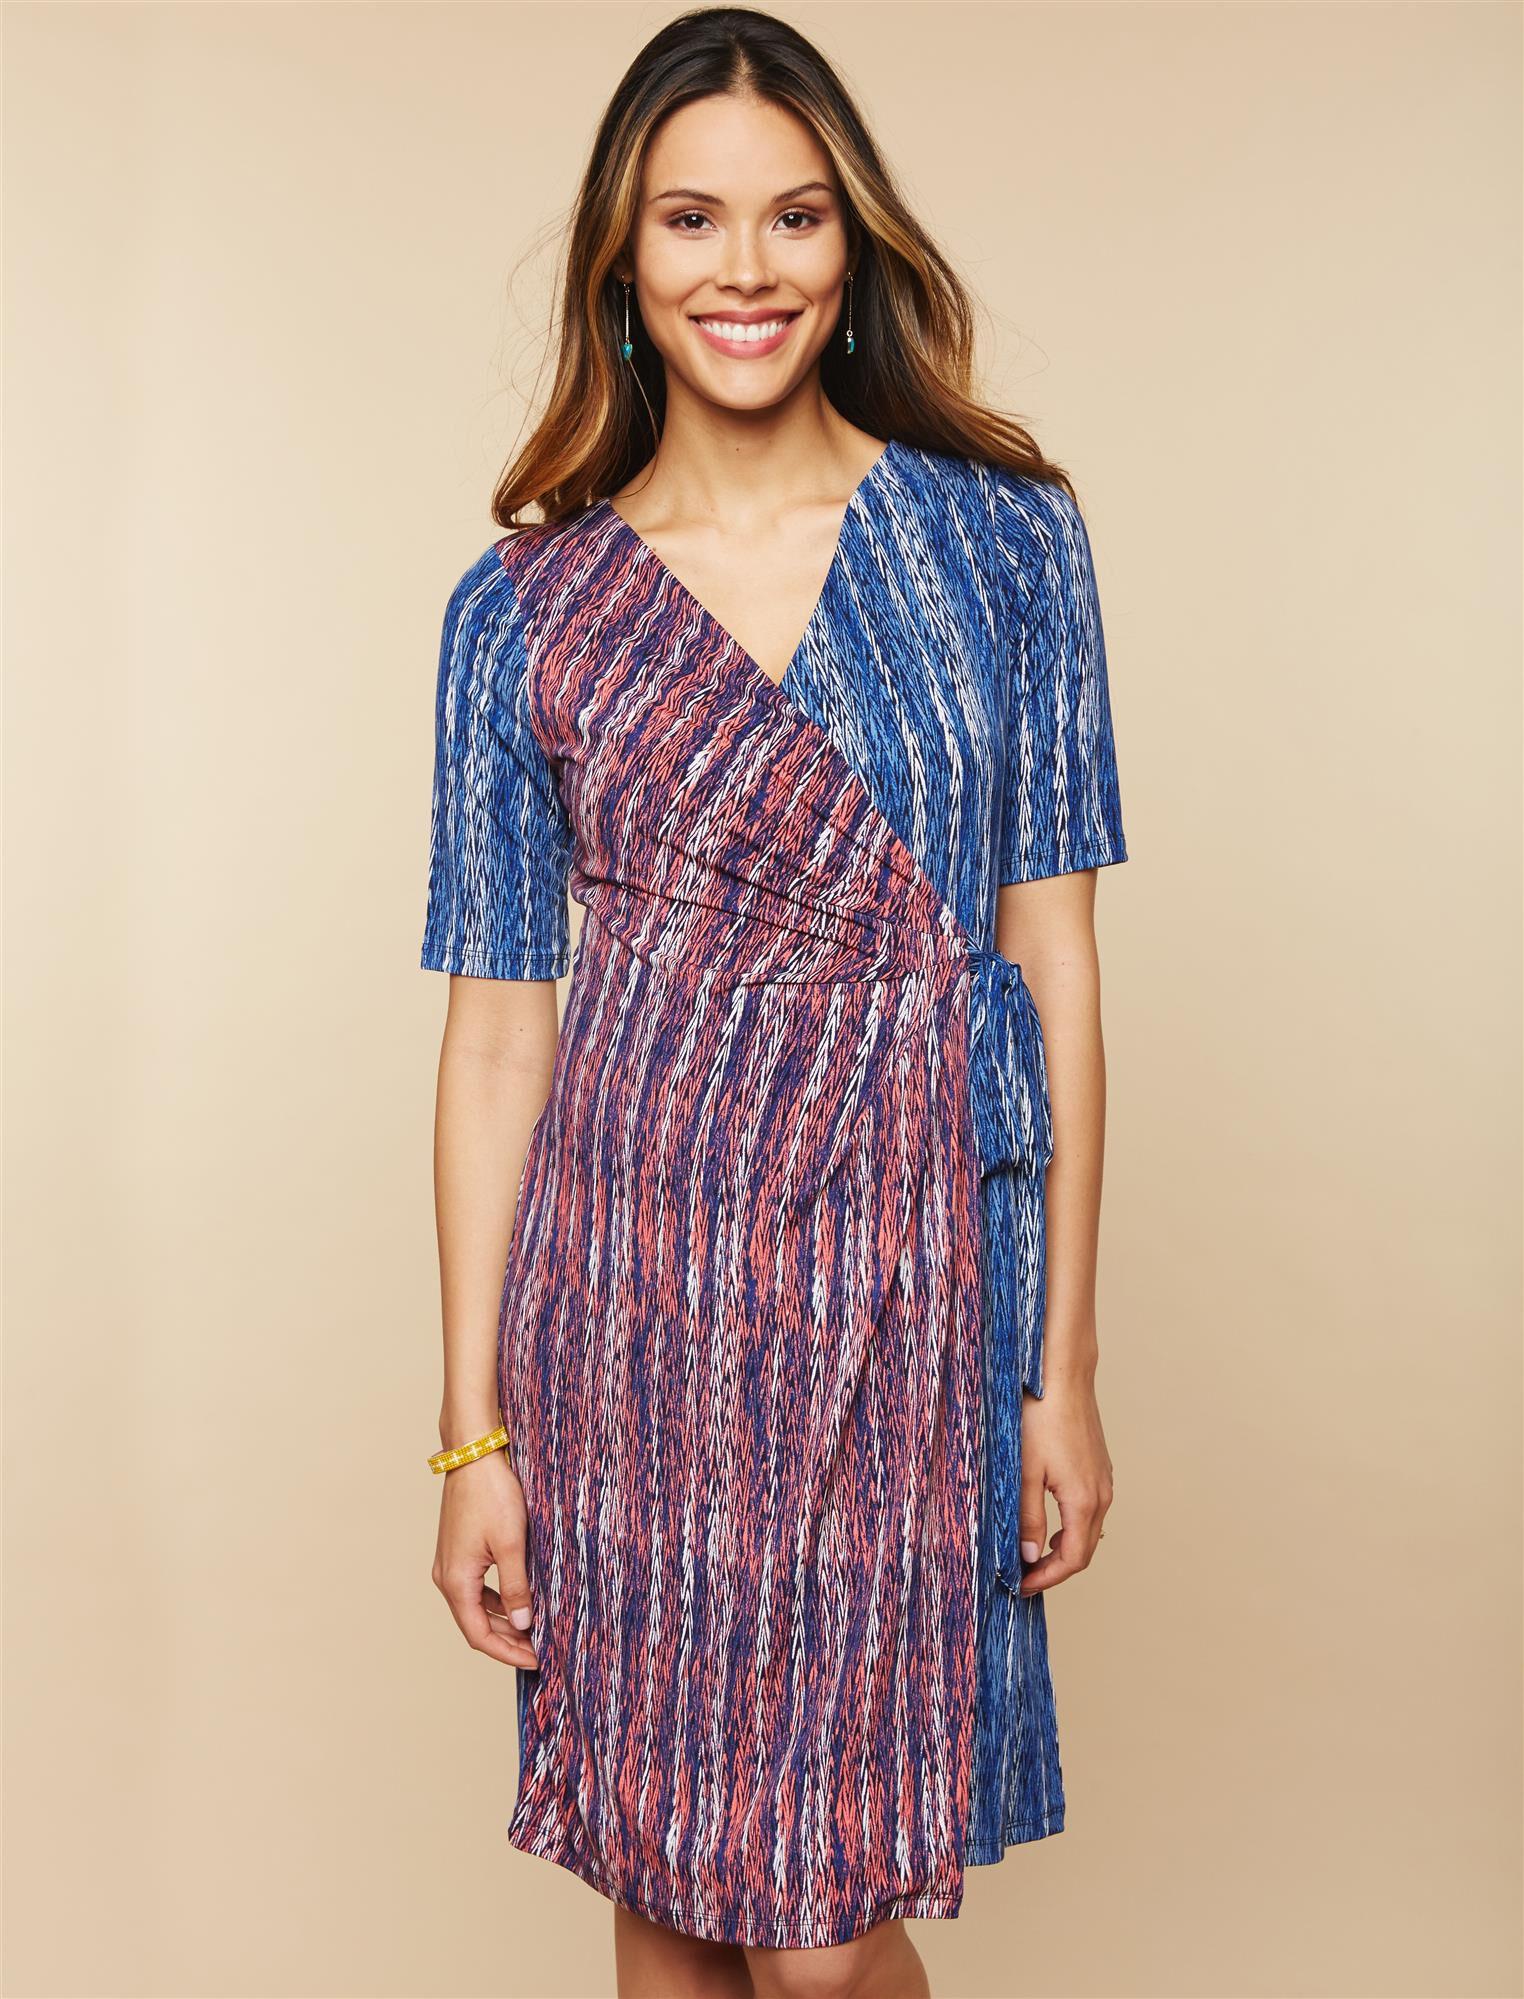 Waist Tie Surplice Maternity Dress- Red Print